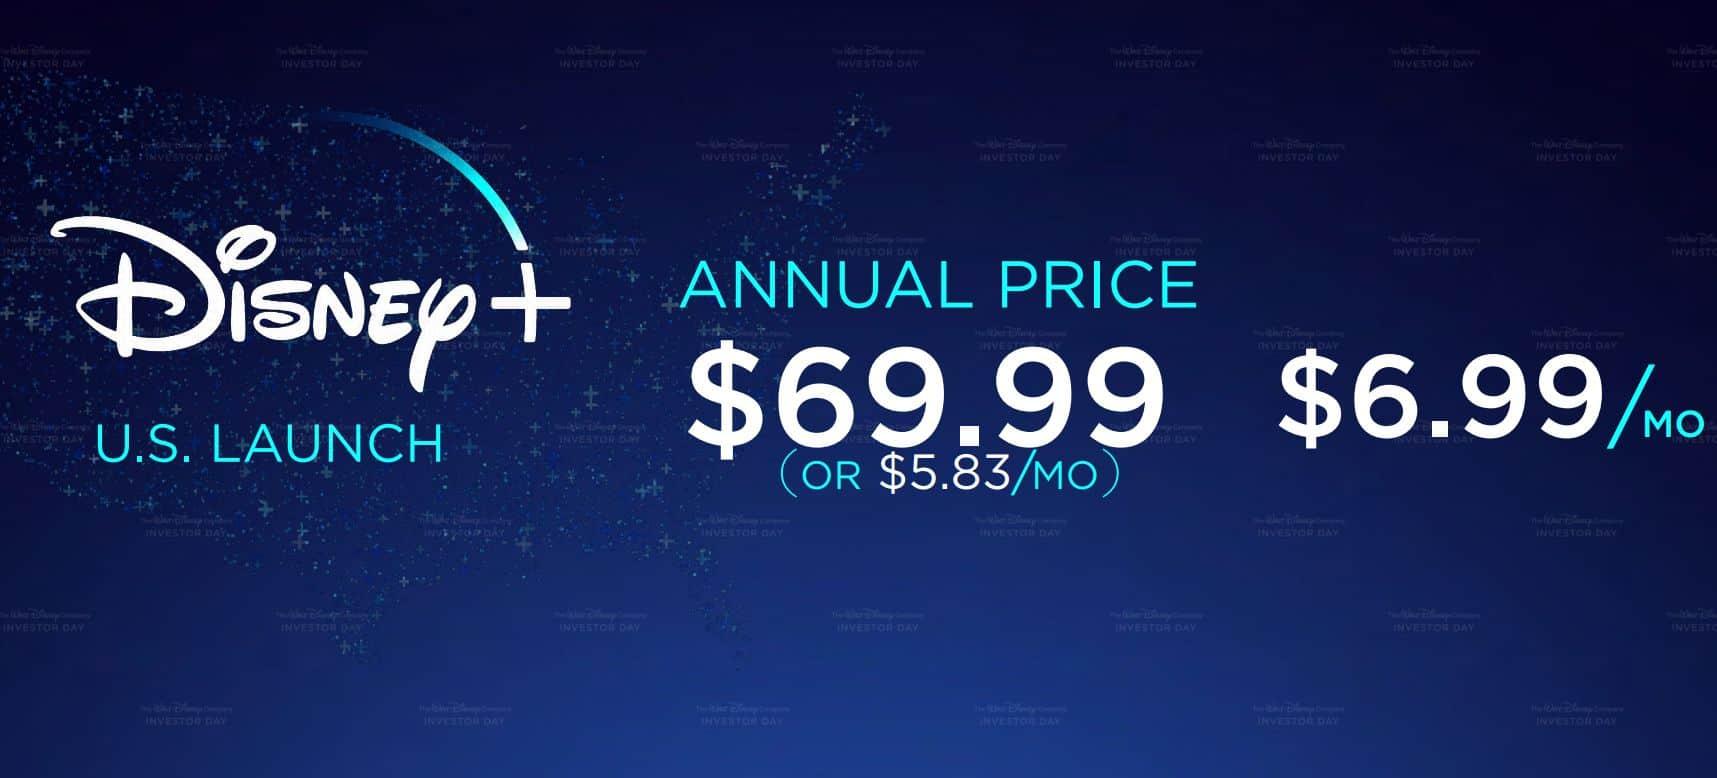 Disney Plus video streaming - Price